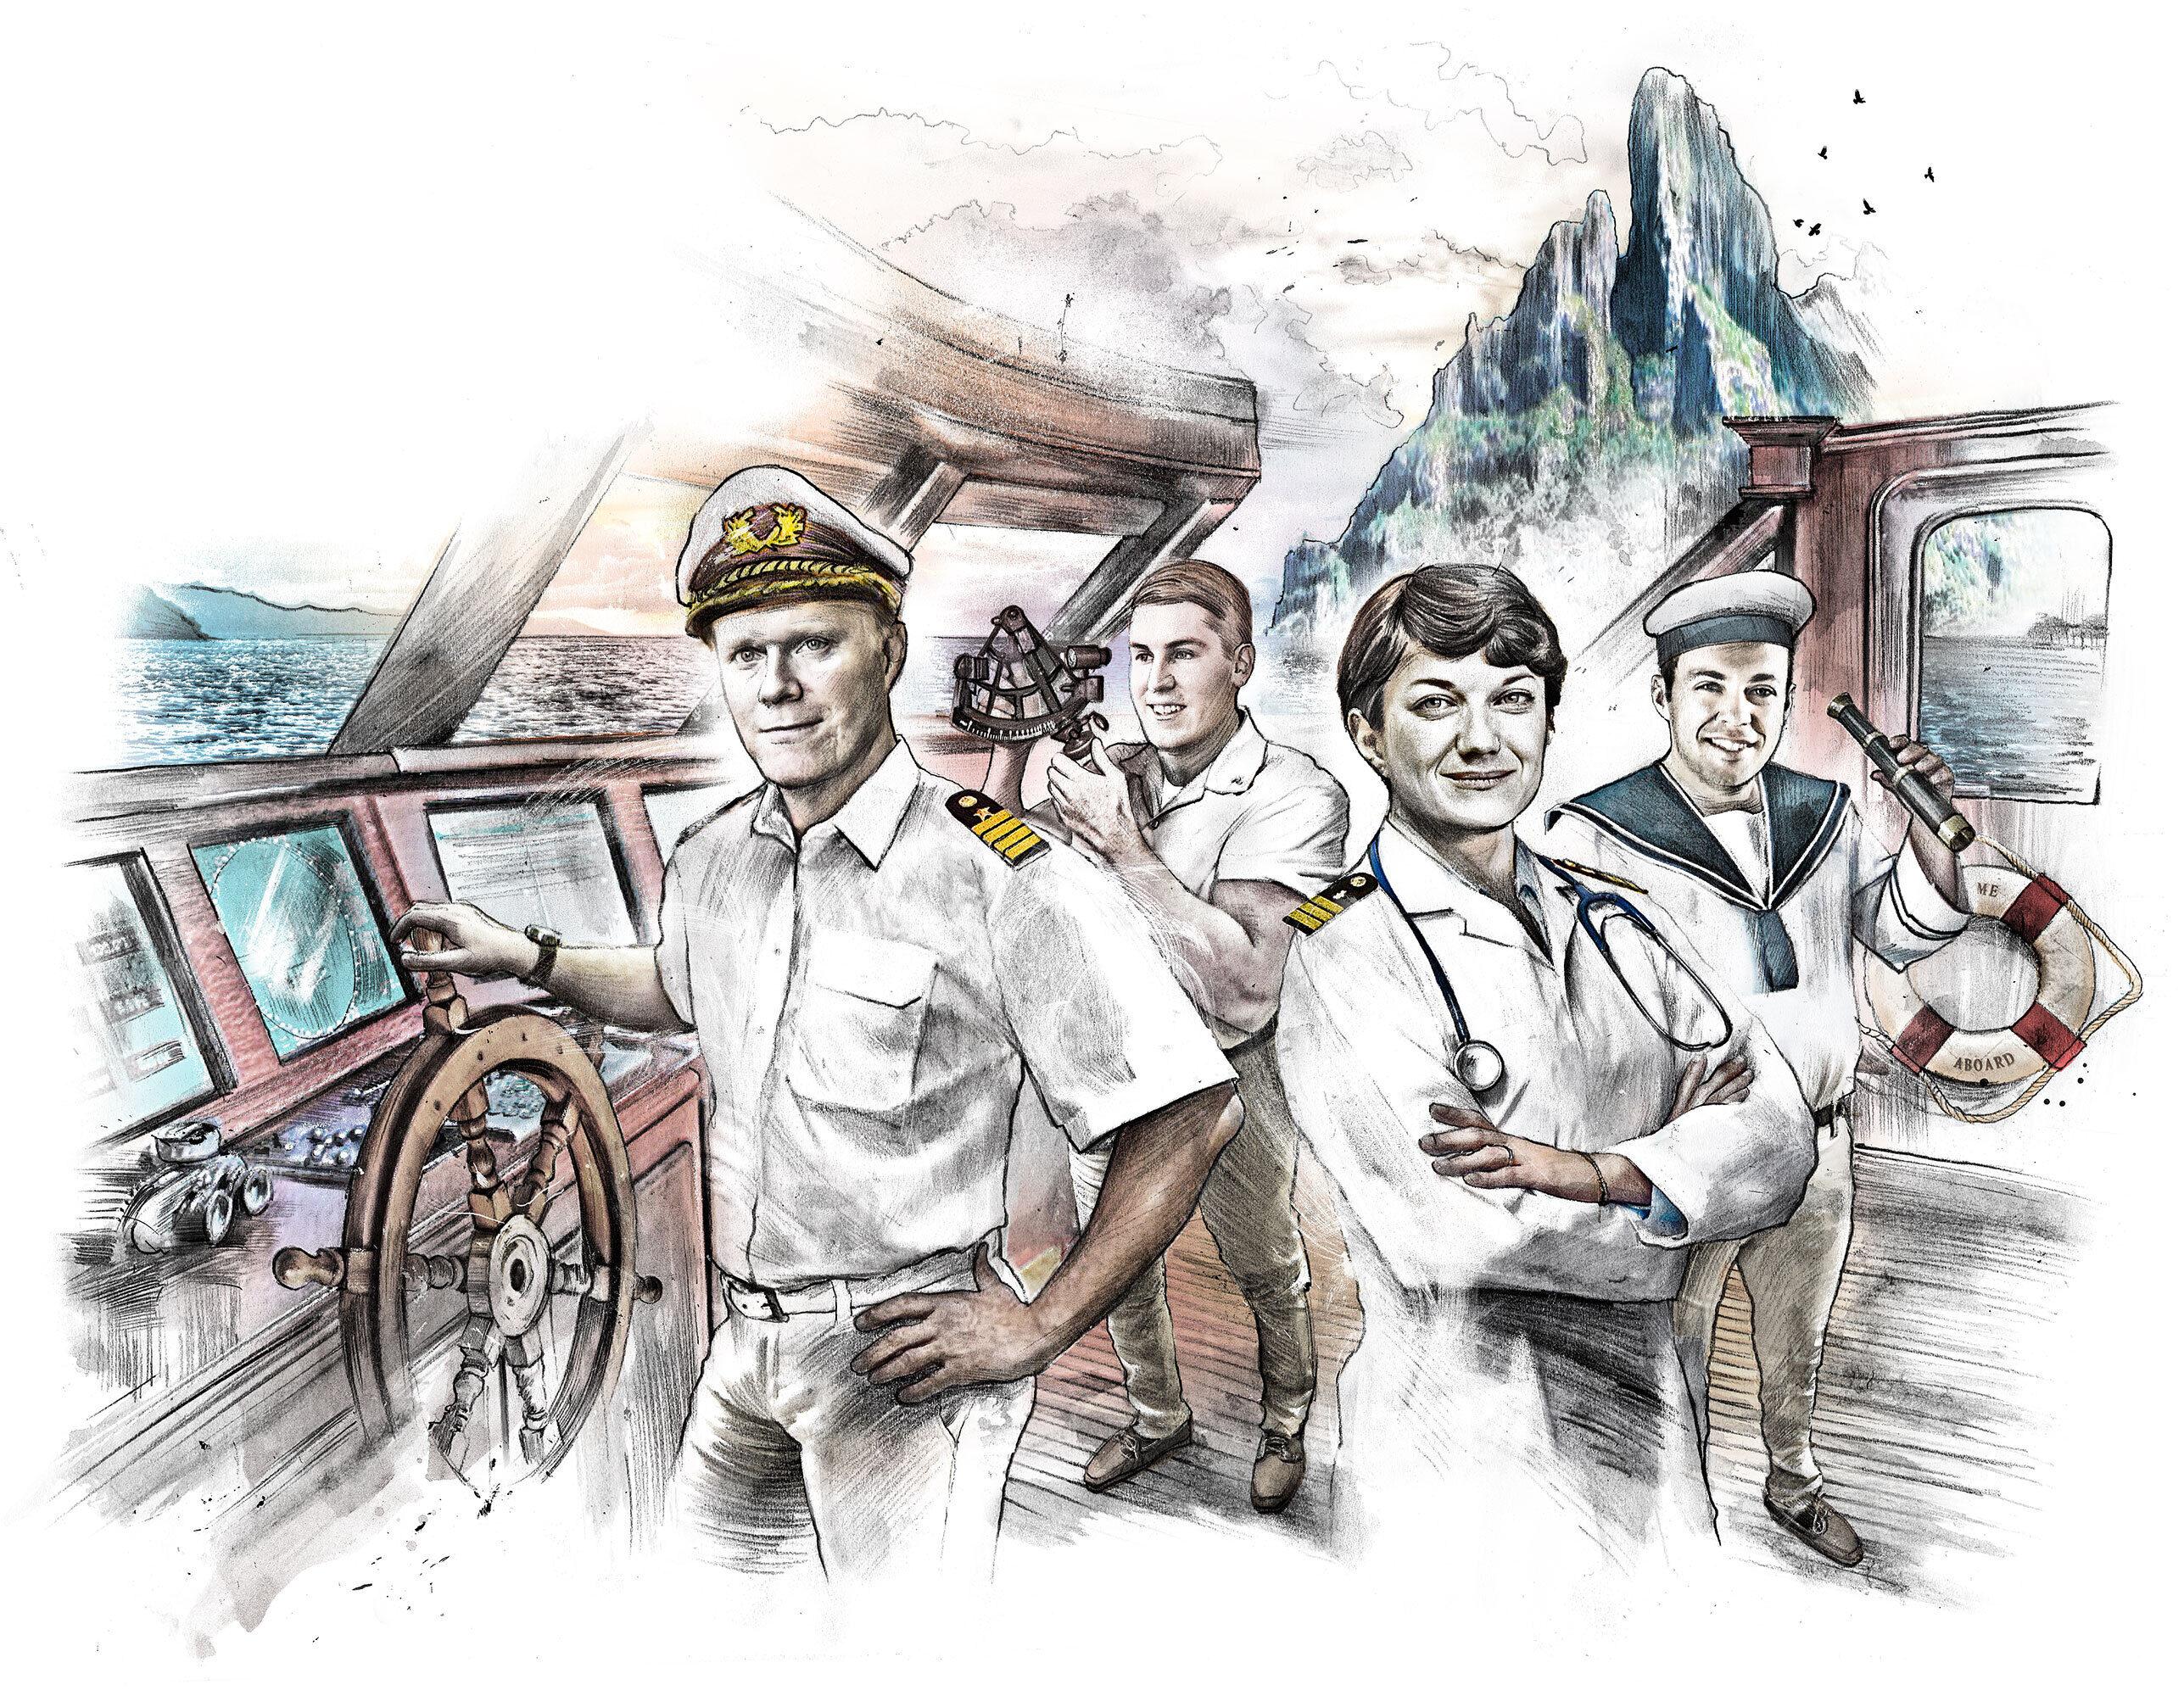 Golden Ager Traumschiff ilustration - Kornel Illustration | Kornel Stadler portfolio